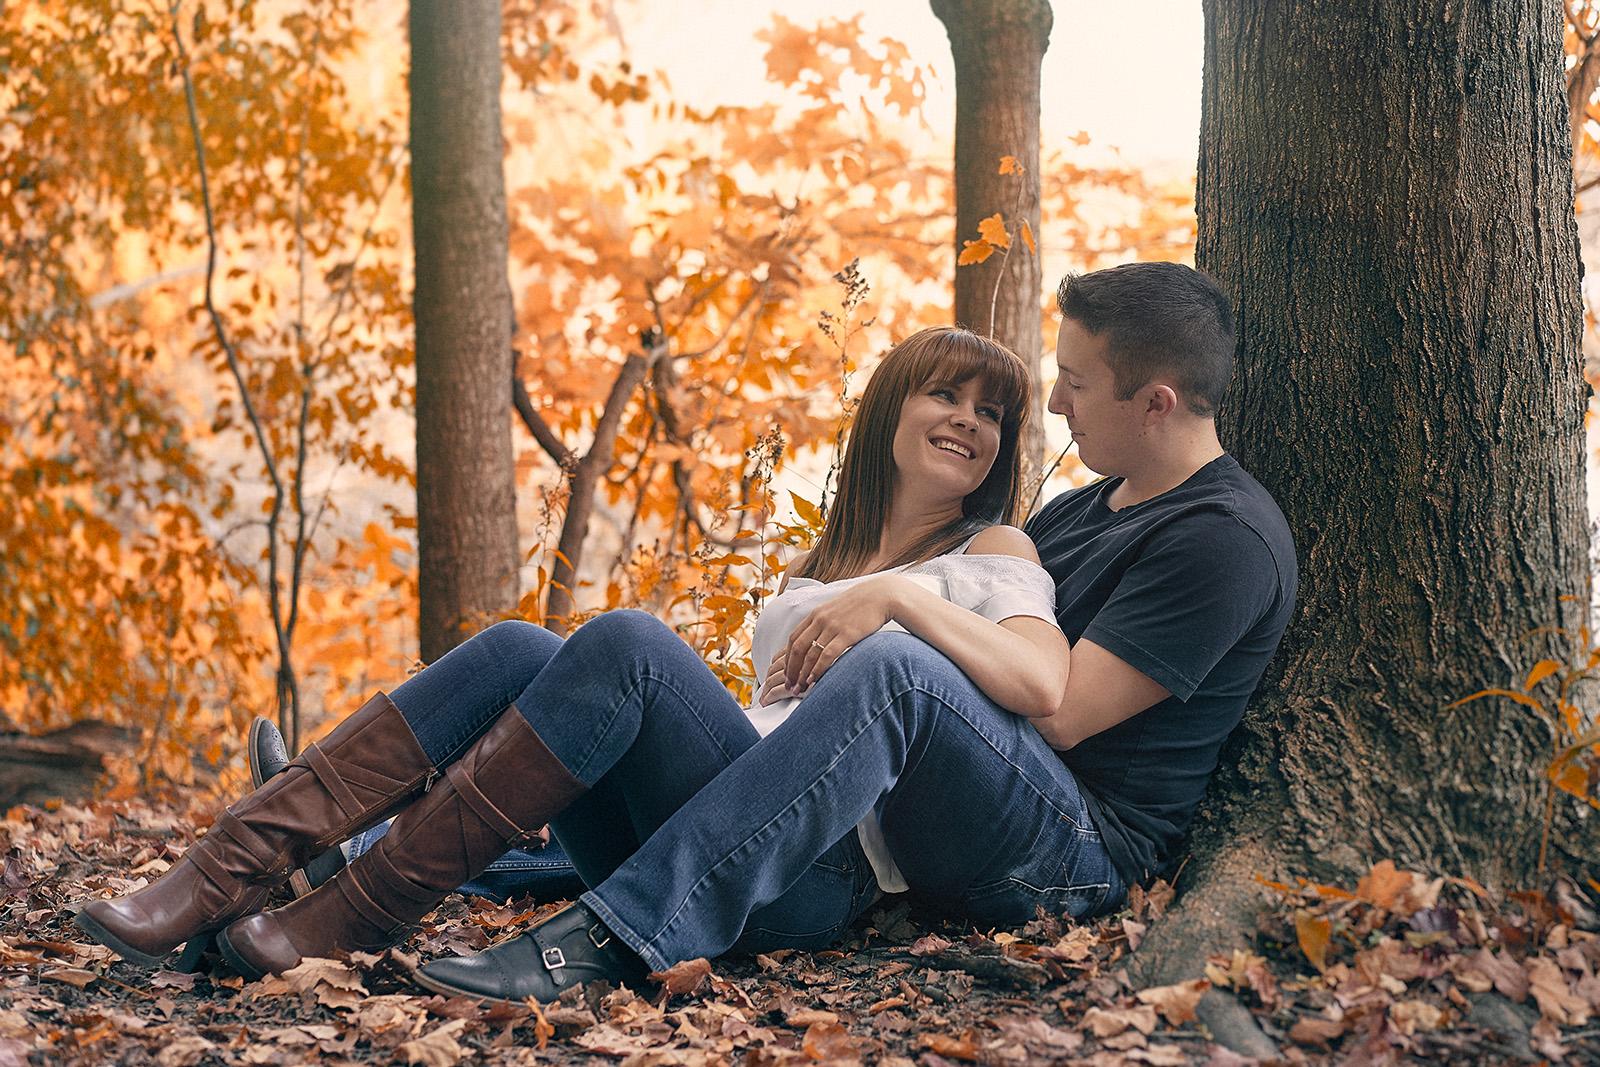 Mike_Mendez_Photography_Wedding_Engagements_11